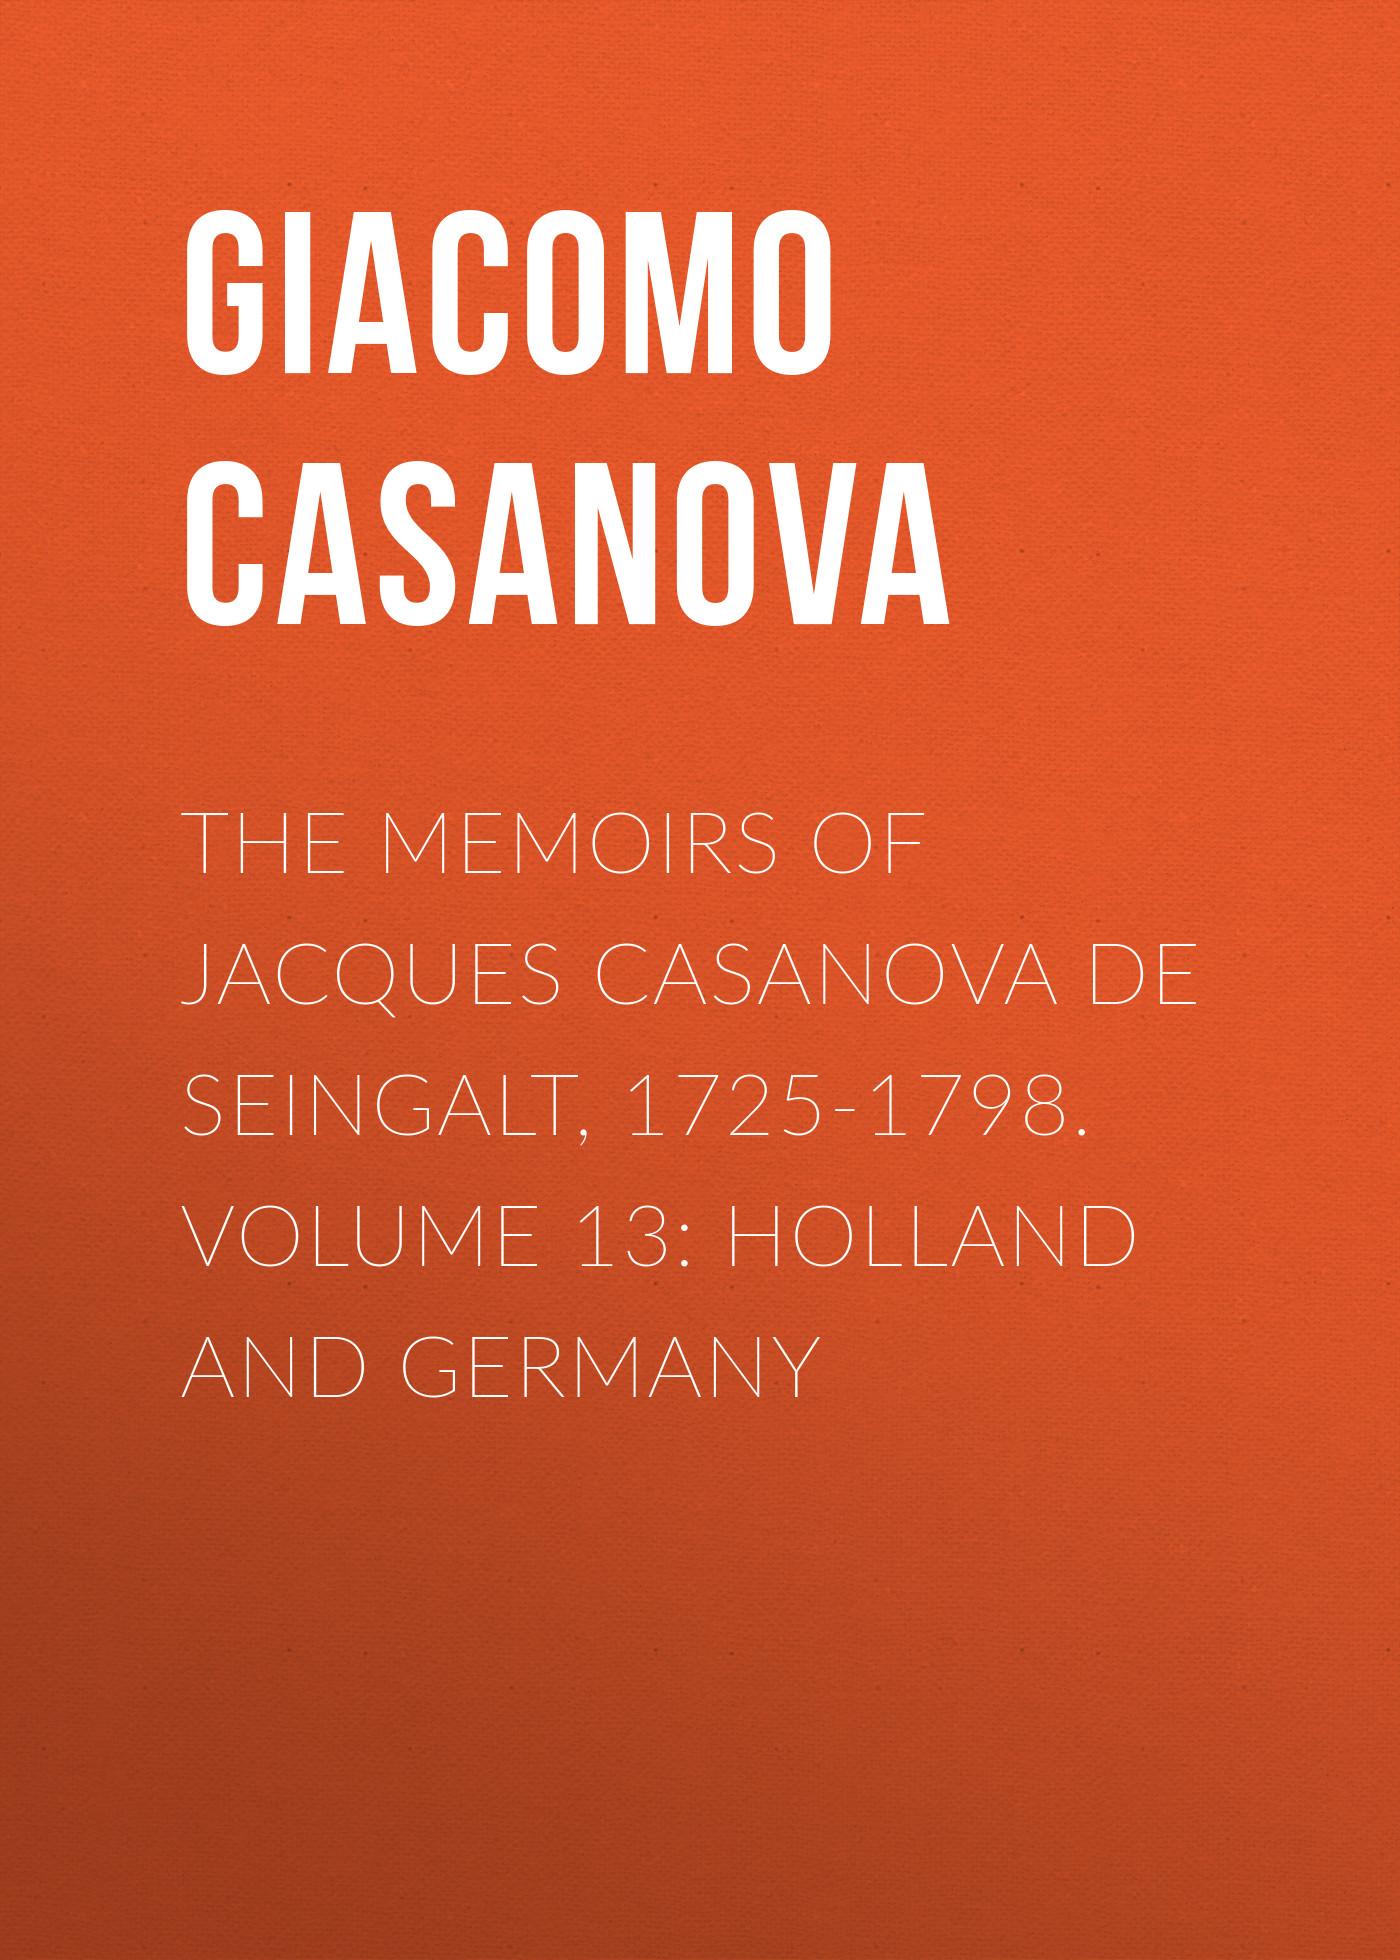 Giacomo Casanova The Memoirs of Jacques Casanova de Seingalt, 1725-1798. Volume 13: Holland and Germany giacomo casanova the memoirs of jacques casanova de seingalt 1725 1798 volume 17 return to italy